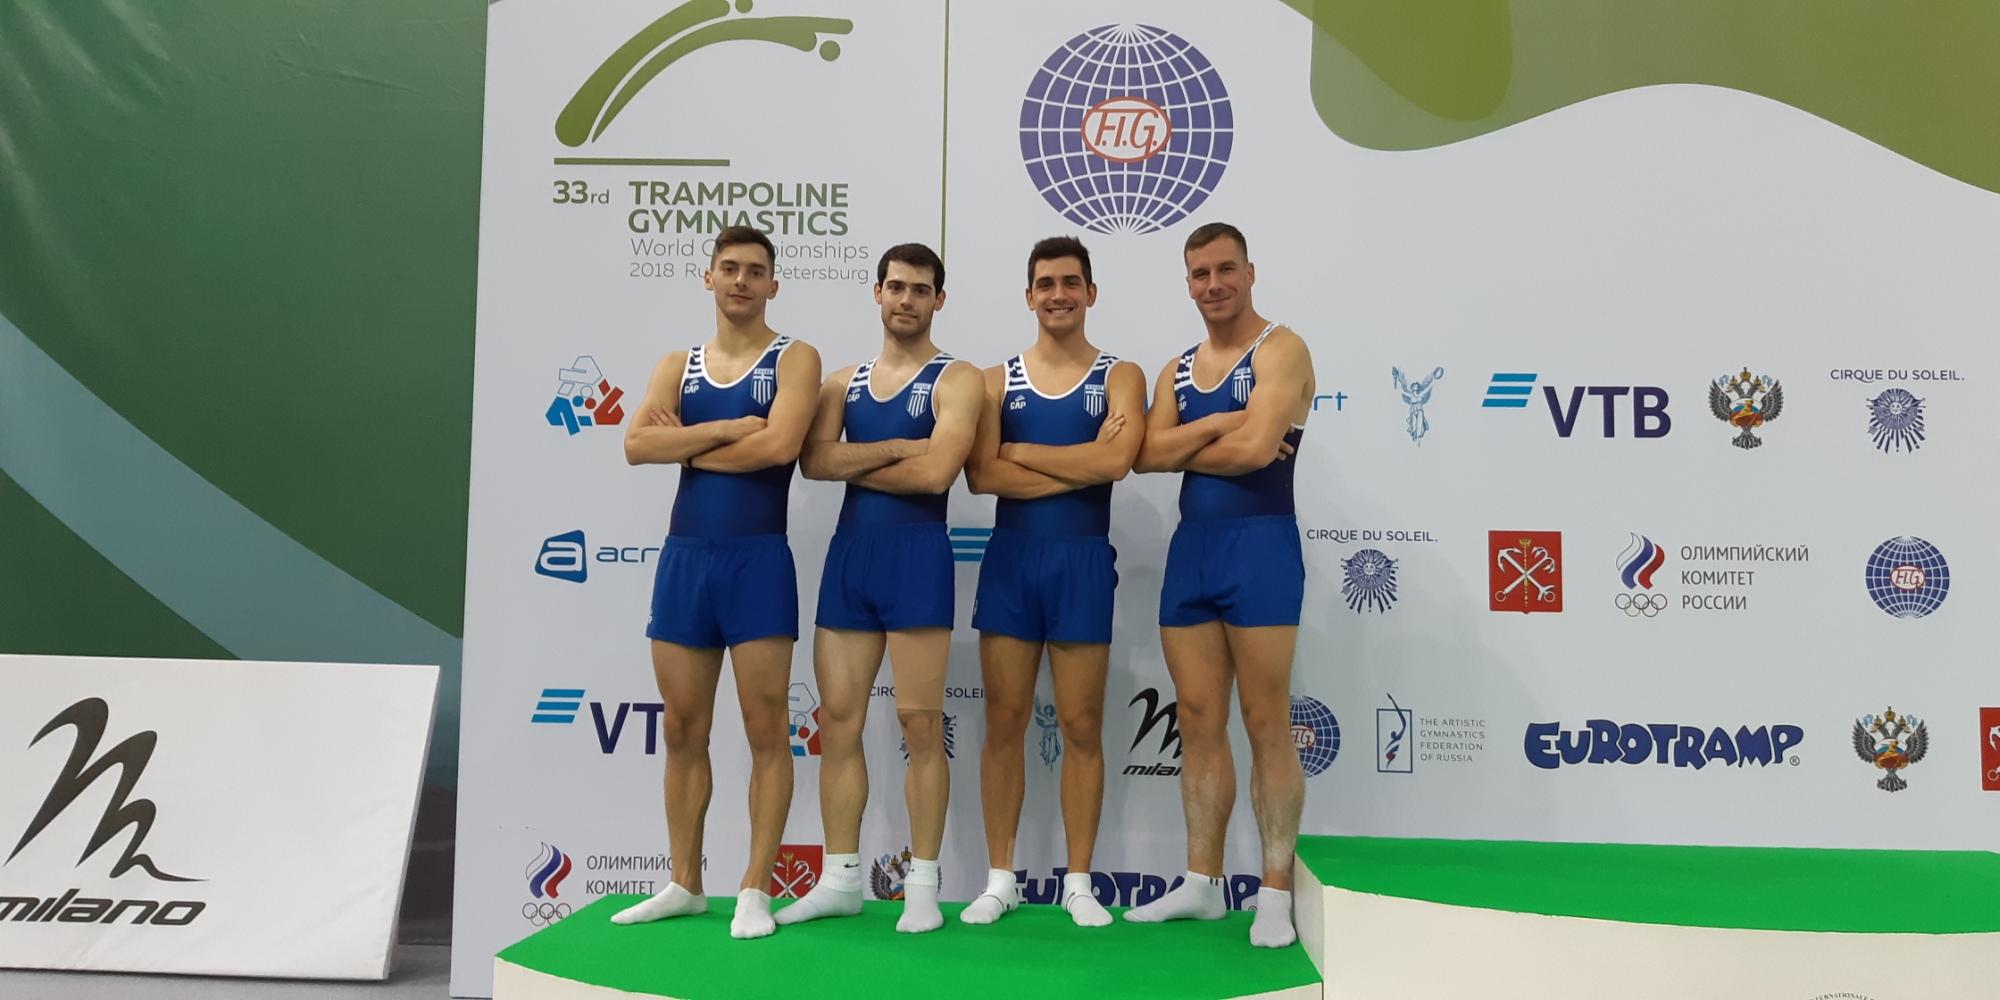 trampolino_st-petersburg2018_03_ethniki-andron